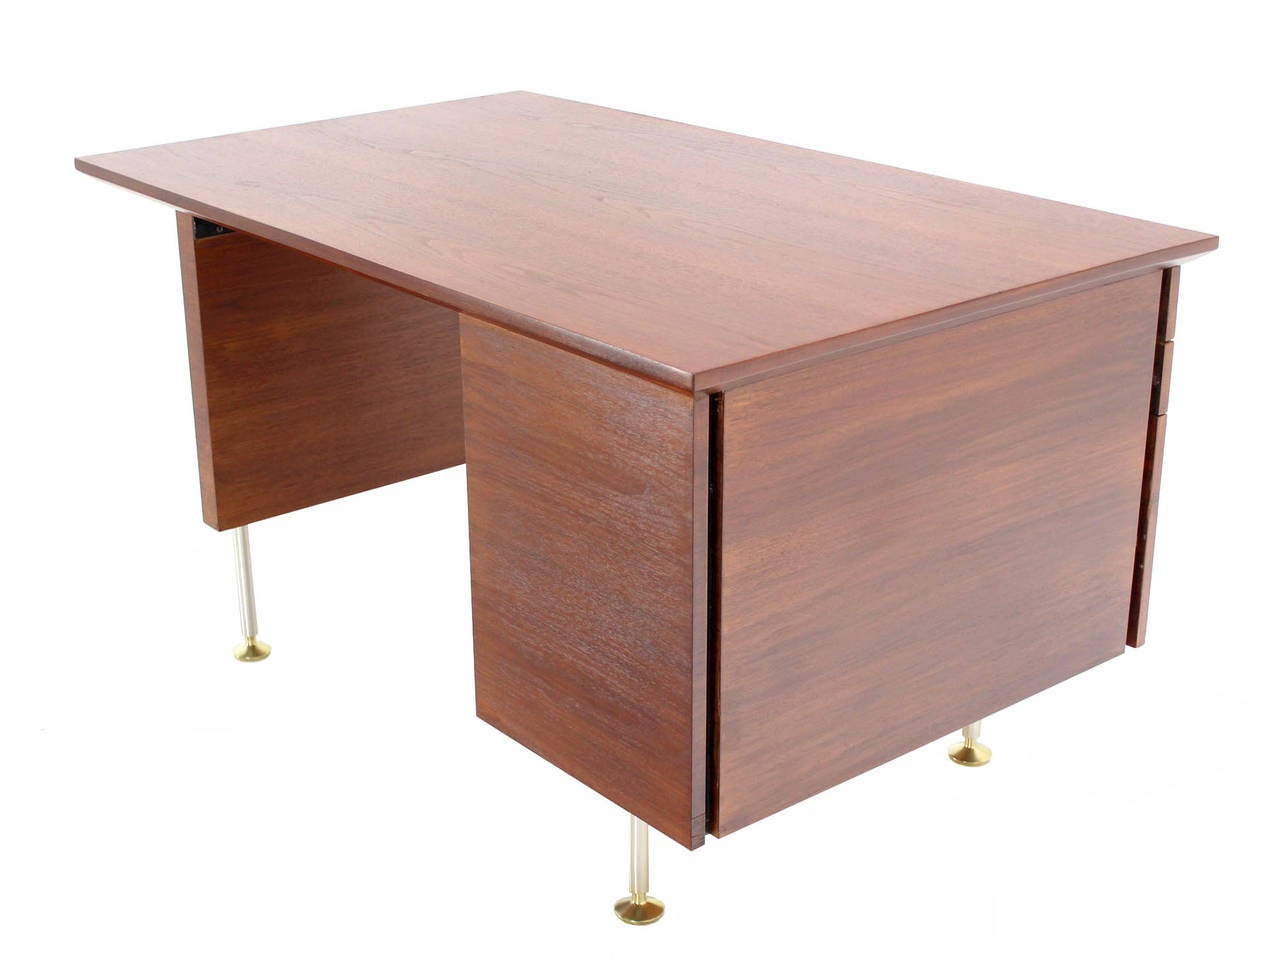 Walnut mid century danish modern desk for sale at 1stdibs for Modern office desk for sale